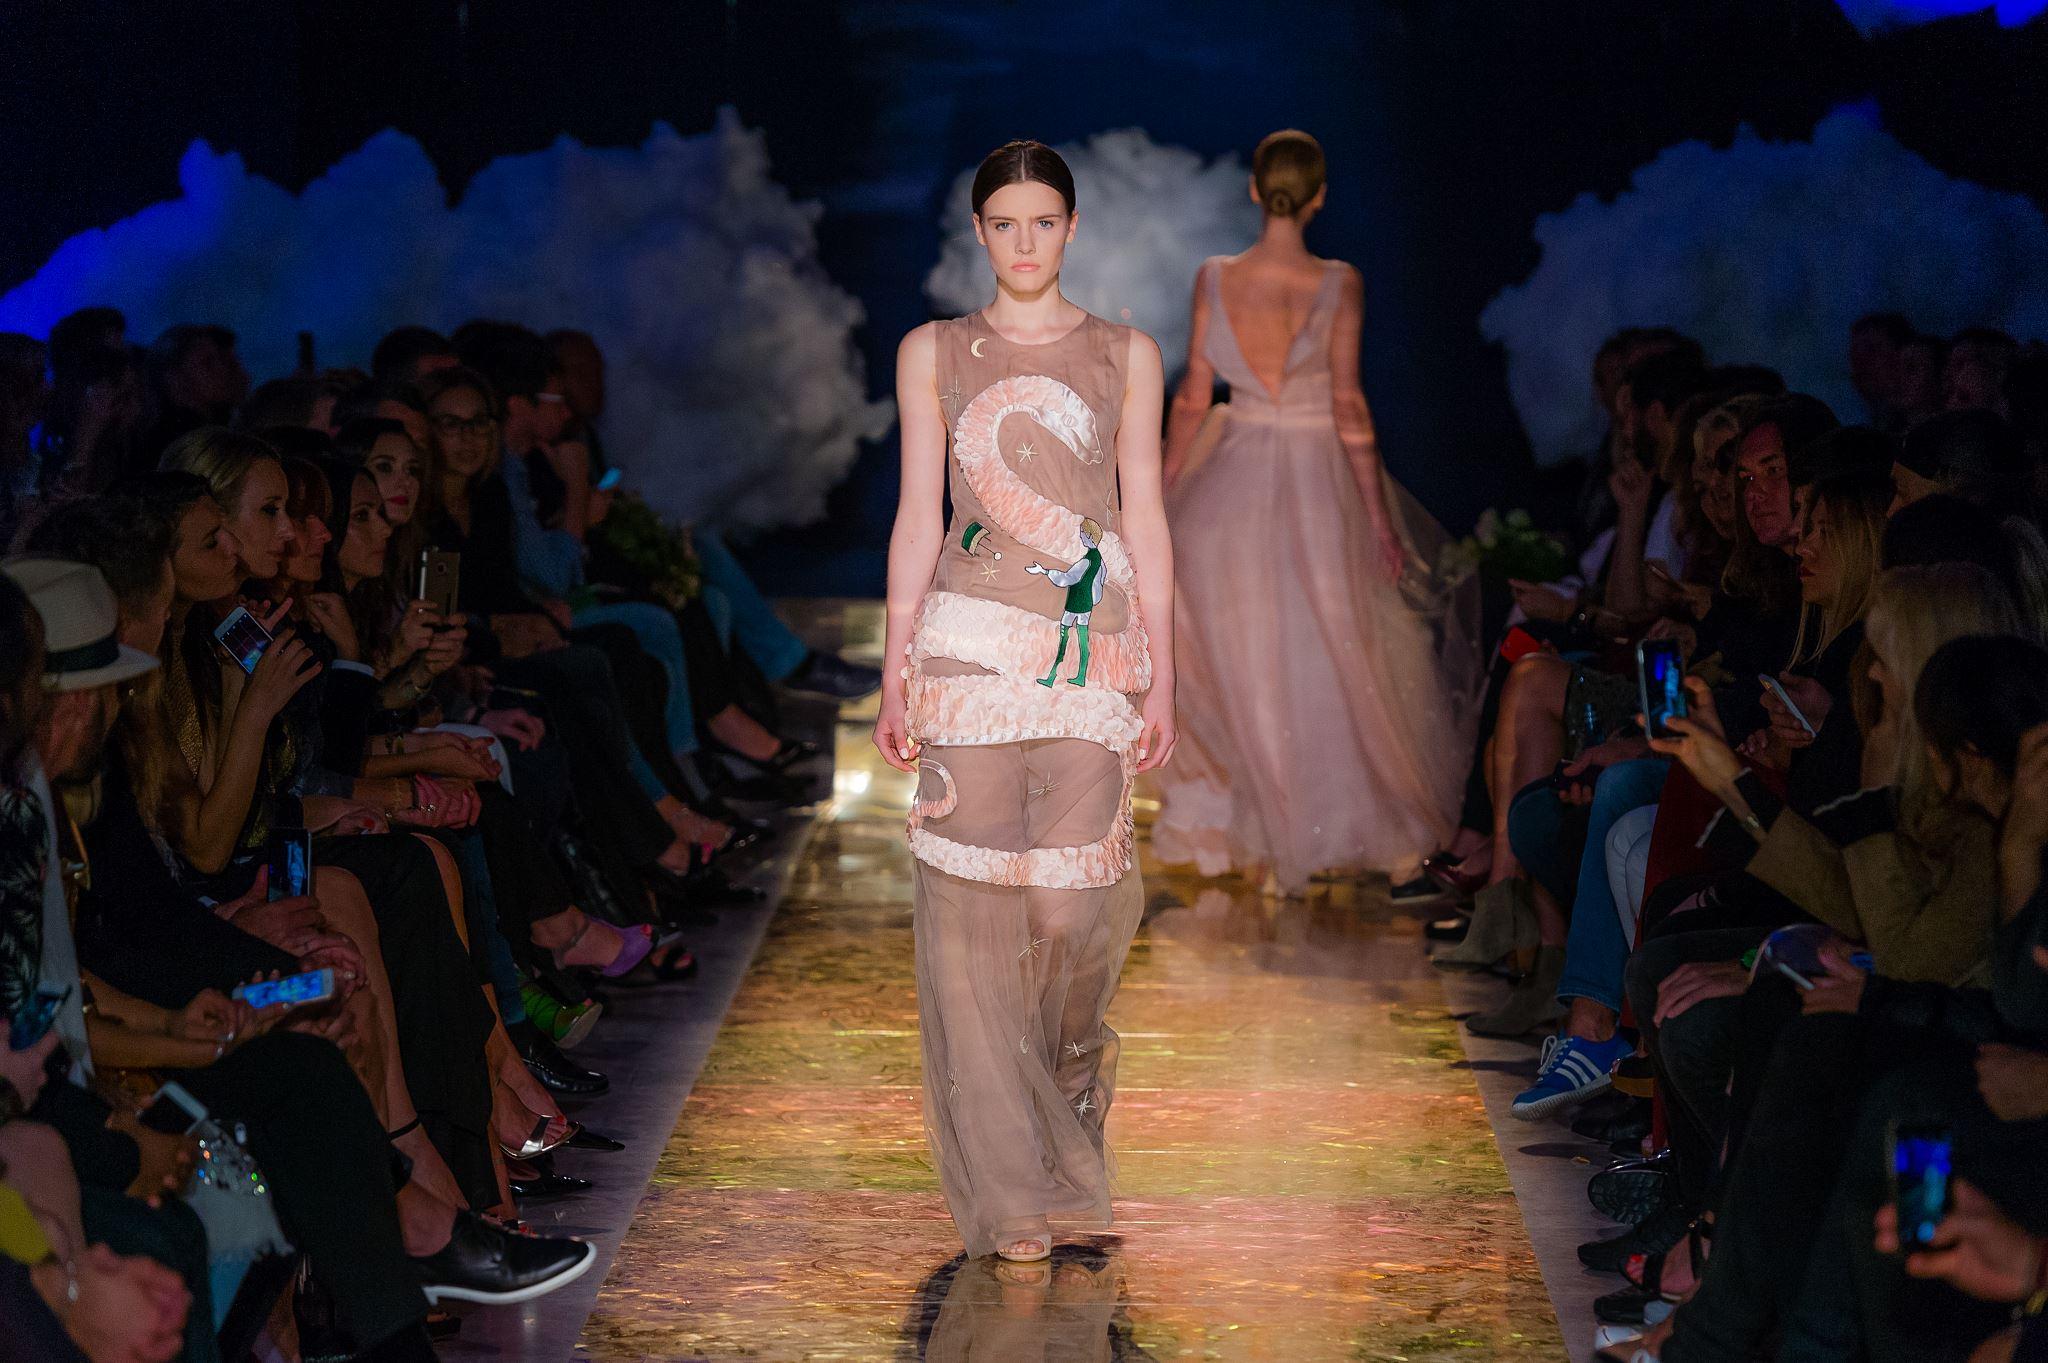 96_maciejzien_190916_web_fot_andrzej_marchwinski_fashion_images